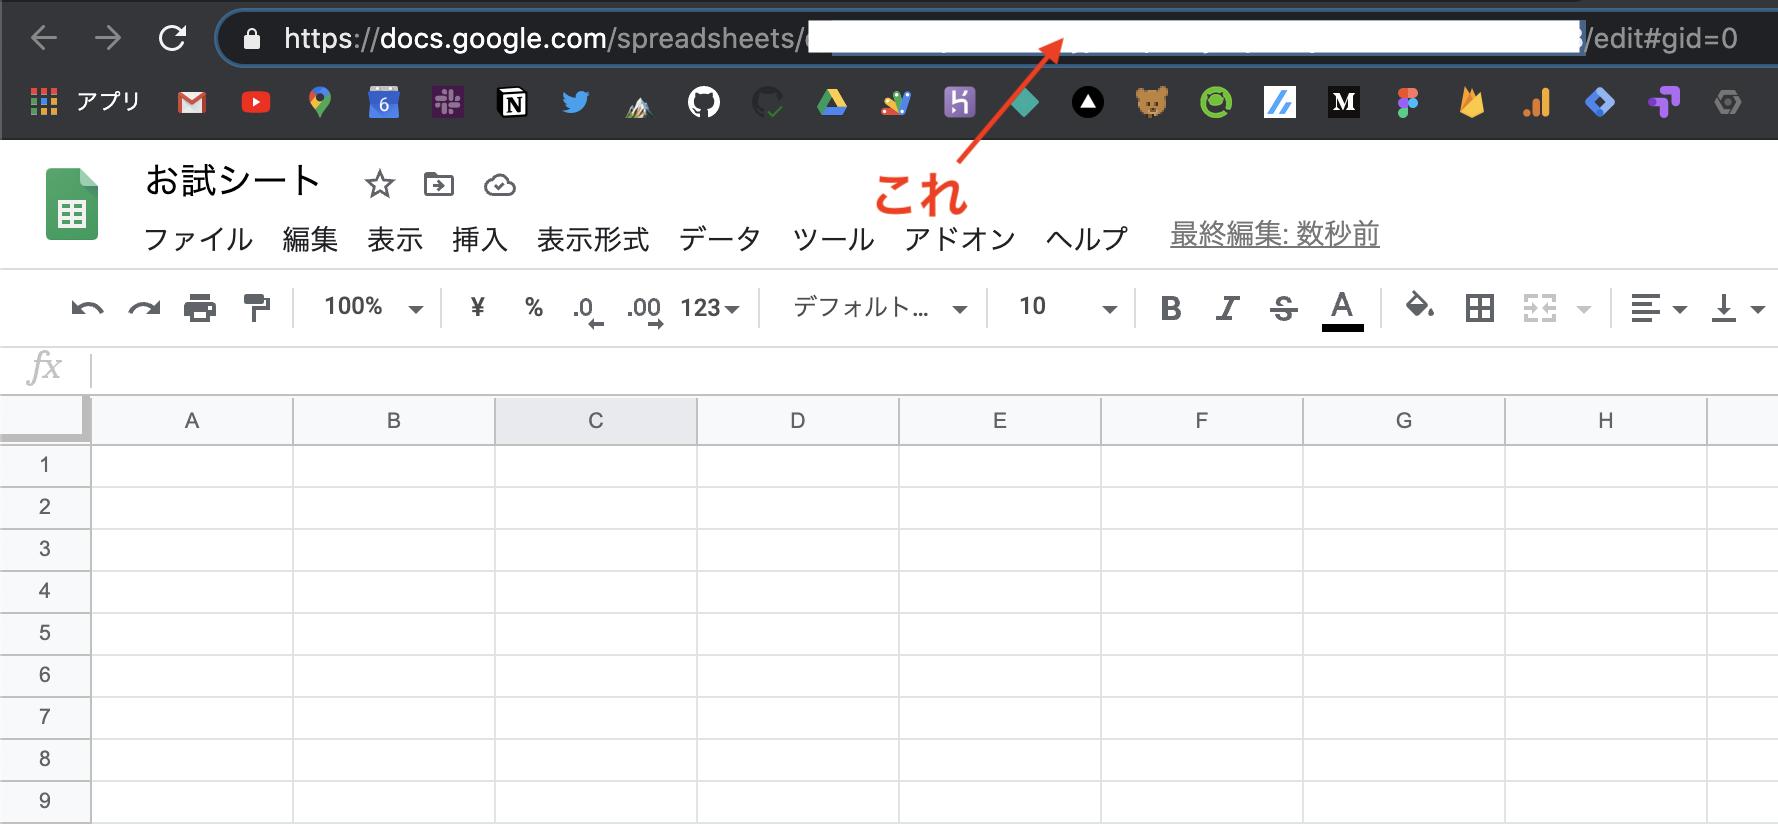 https://res.cloudinary.com/dw86z2fnr/image/upload/v1620383439/titanicrising.jp/write-gas-in-ts/_2020-10-09_10.23.03_lgadcm.png